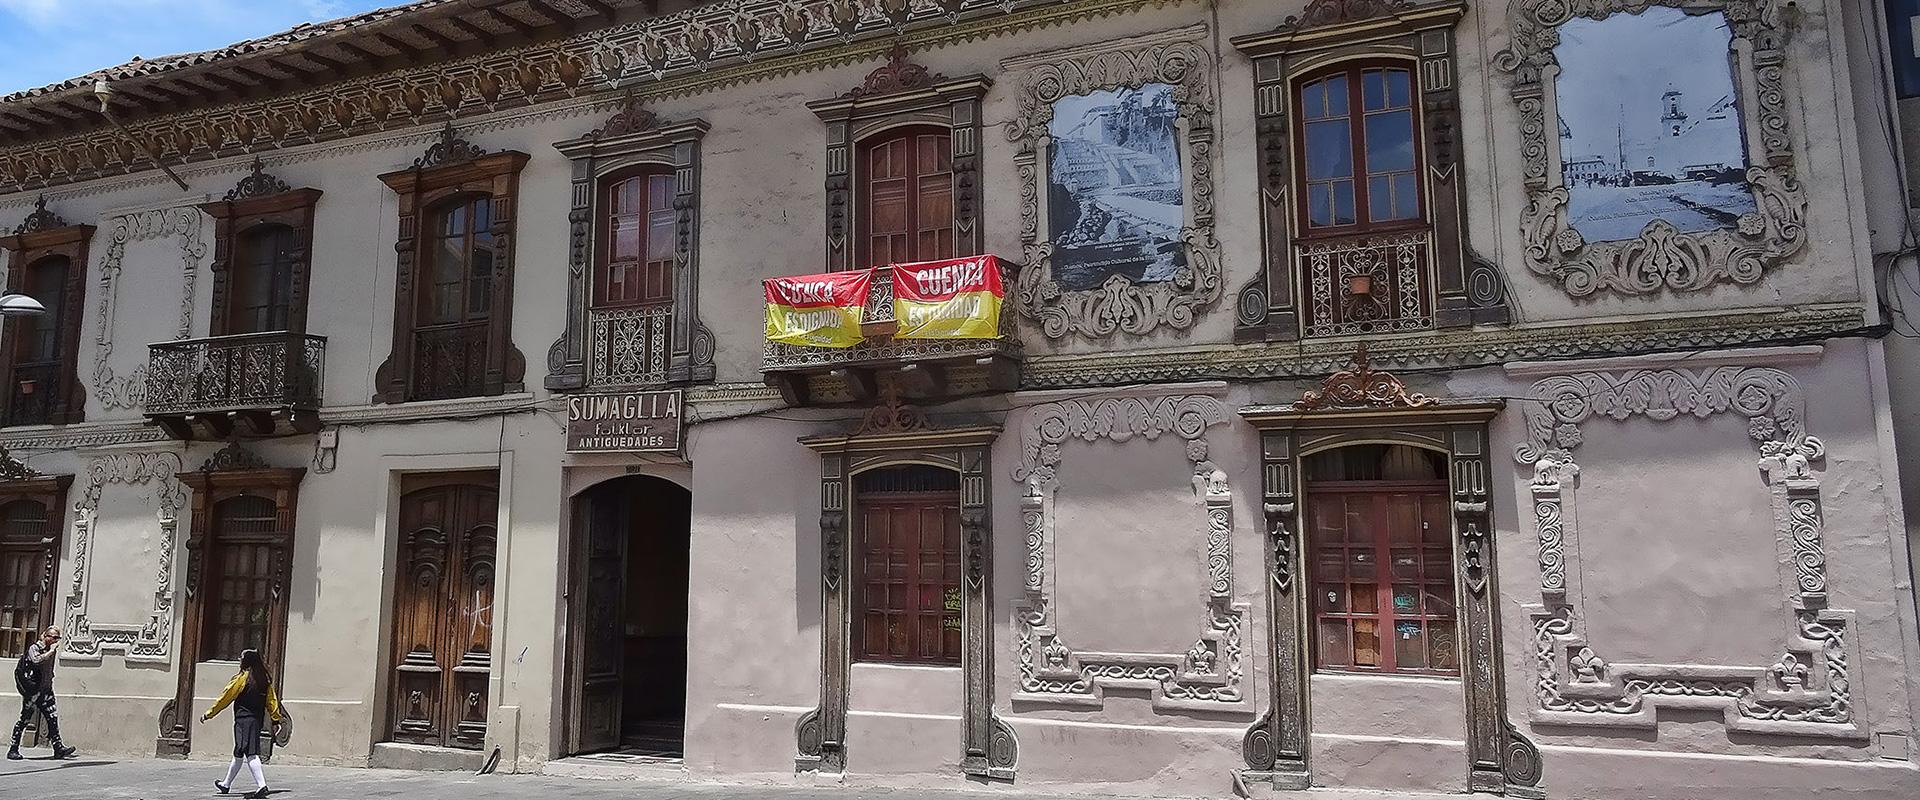 Cuenca Half Day City Tour